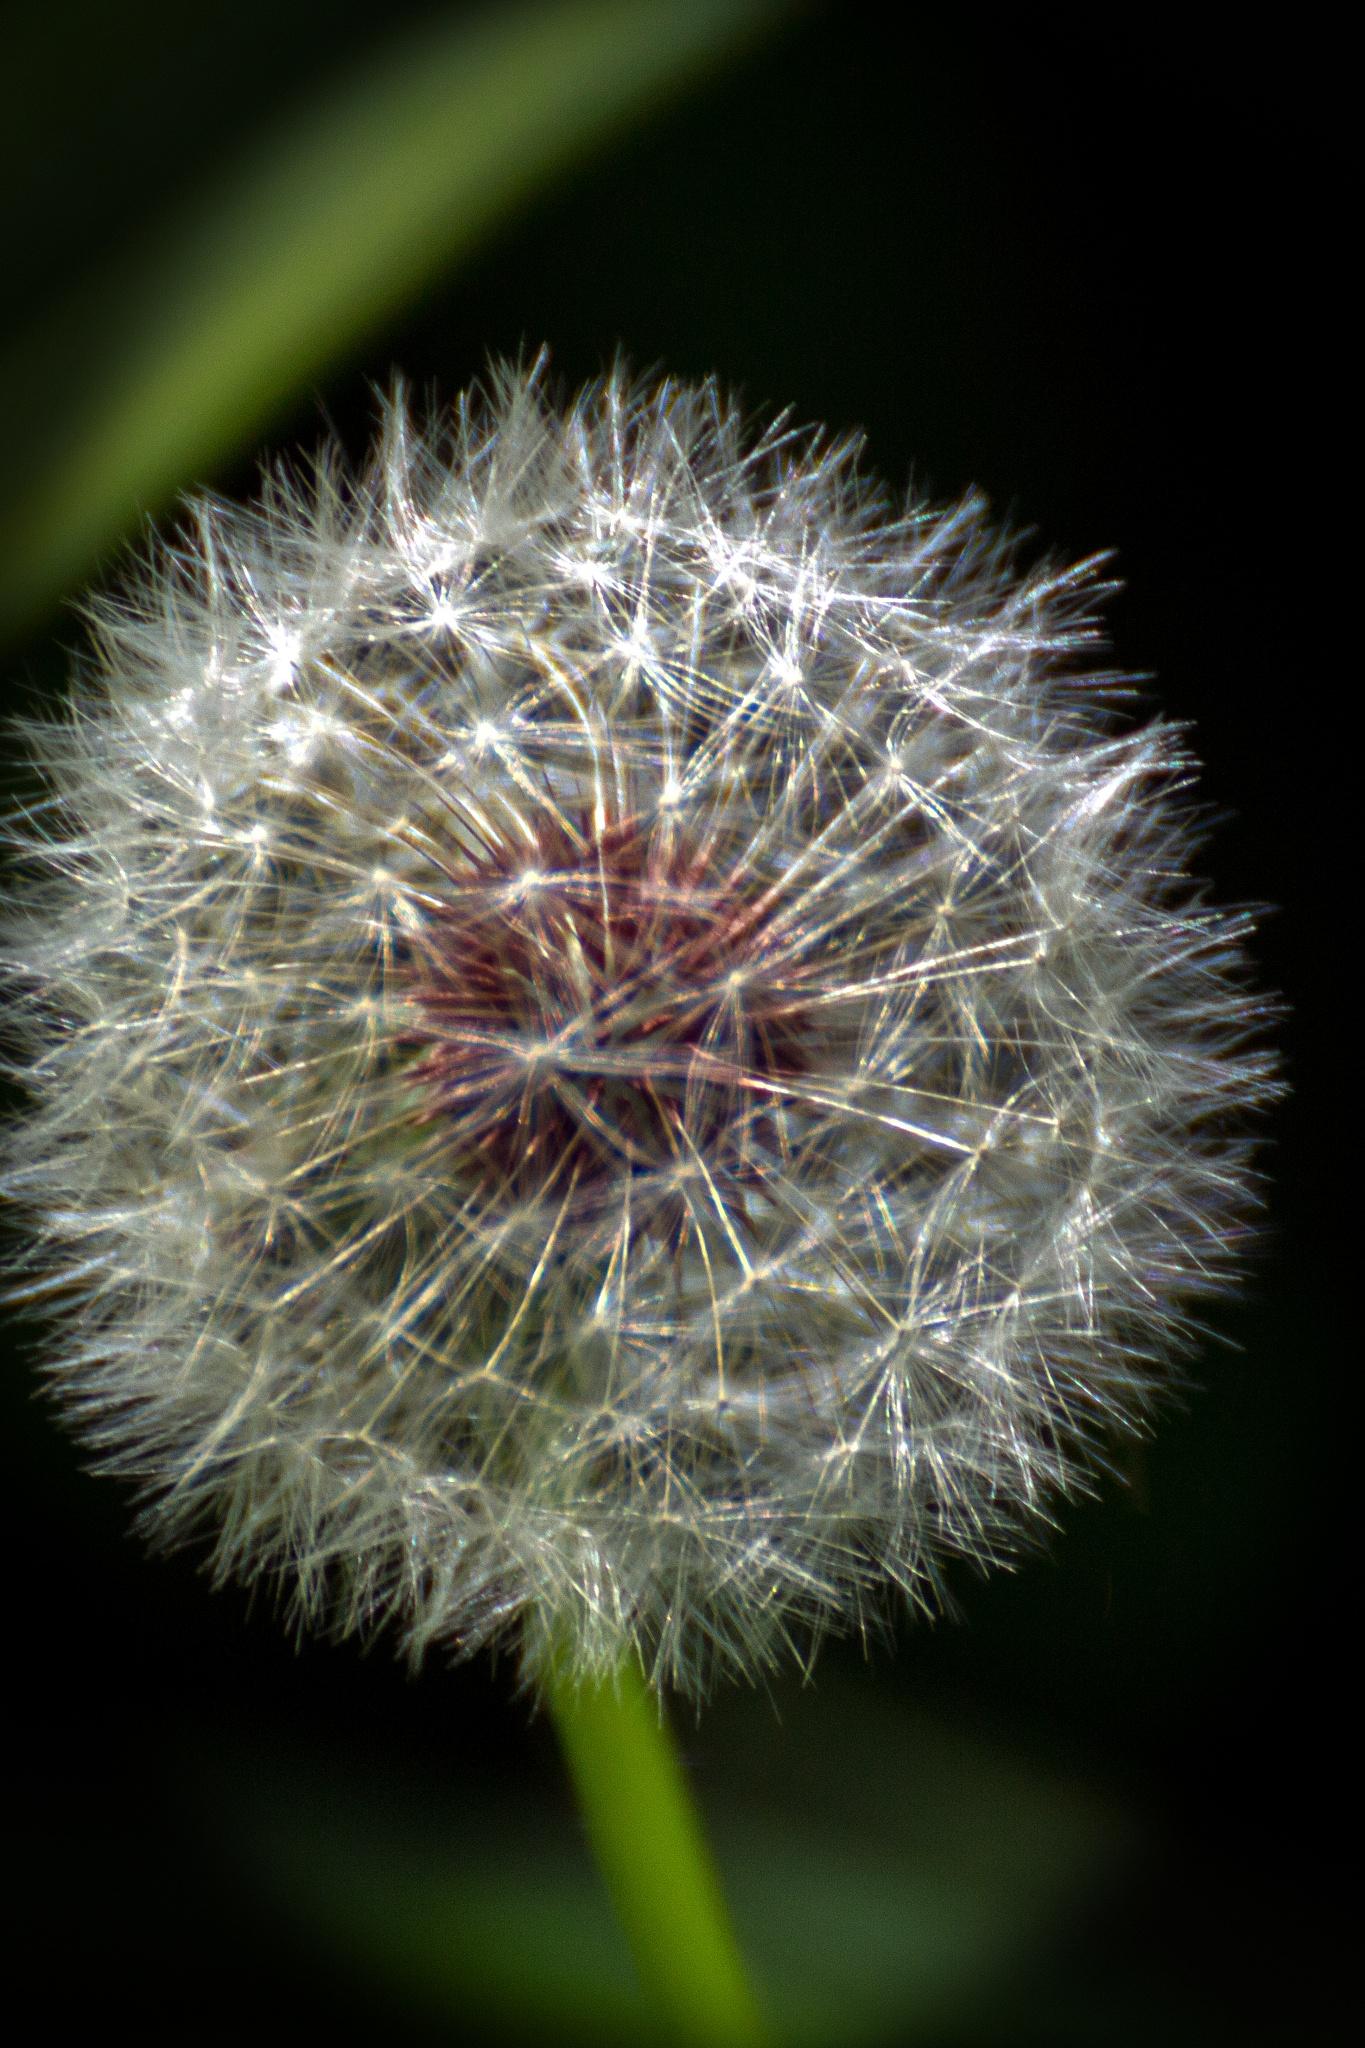 Dandelion Up Close by Judy Florio